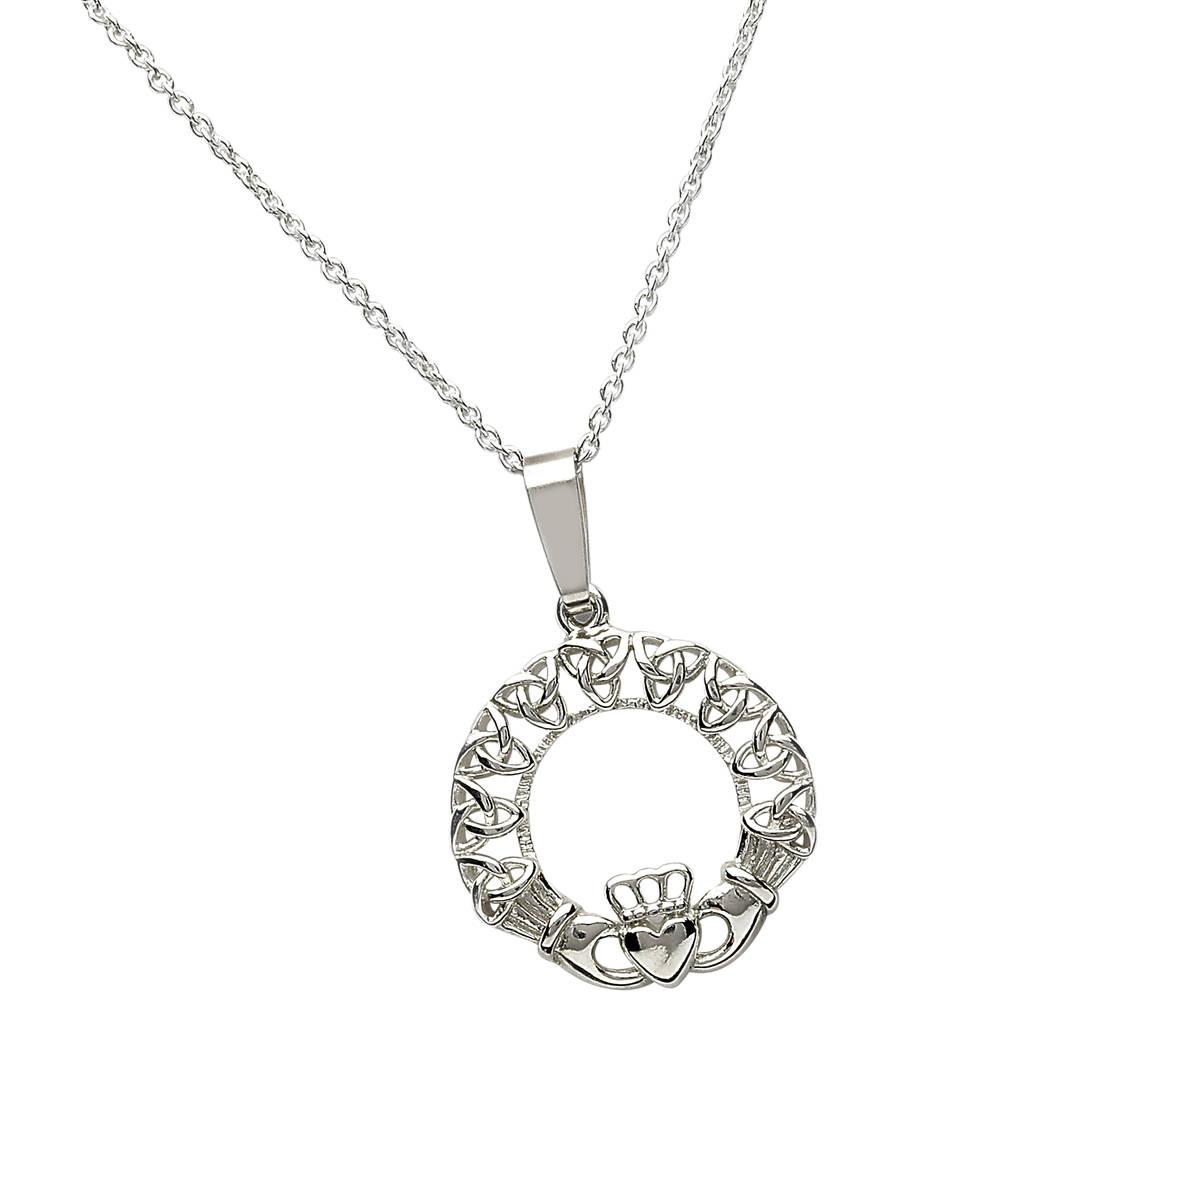 Silver Claddagh Trinity Knot Pendant